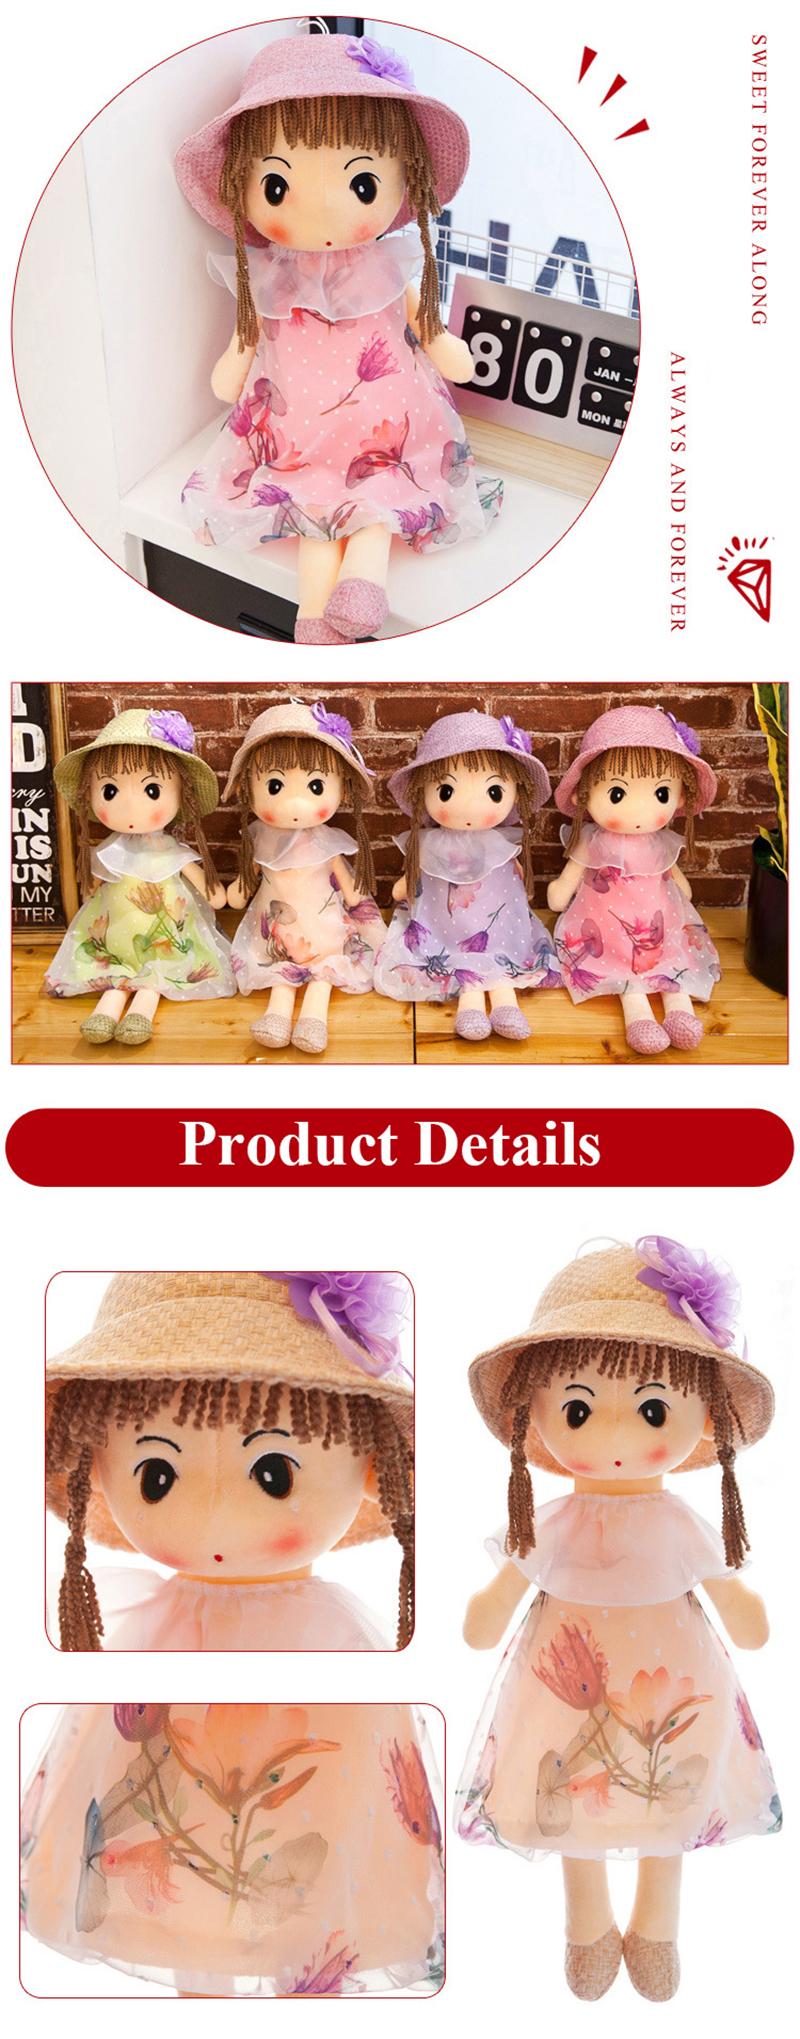 1pcs 40cm Plush Dolls Accompany Doll Toys Cute Cartoon Ragdoll Stuffed Flower Dress Girls Plush Rag Doll Toys for Children Gifts (8)